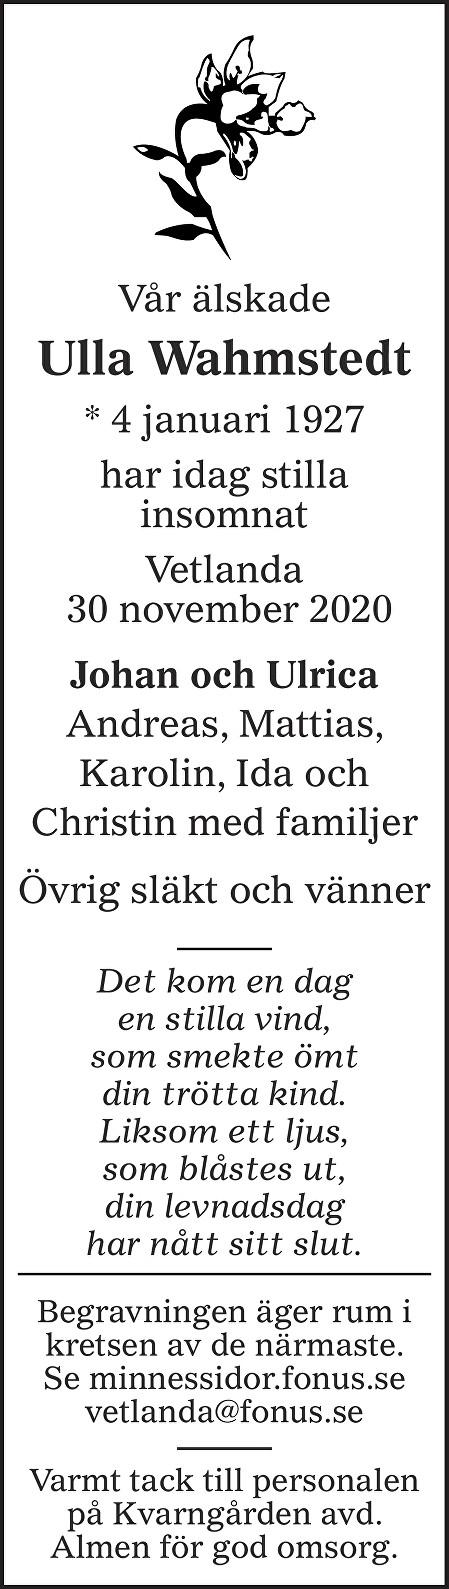 Ulla Wahmstedt Death notice